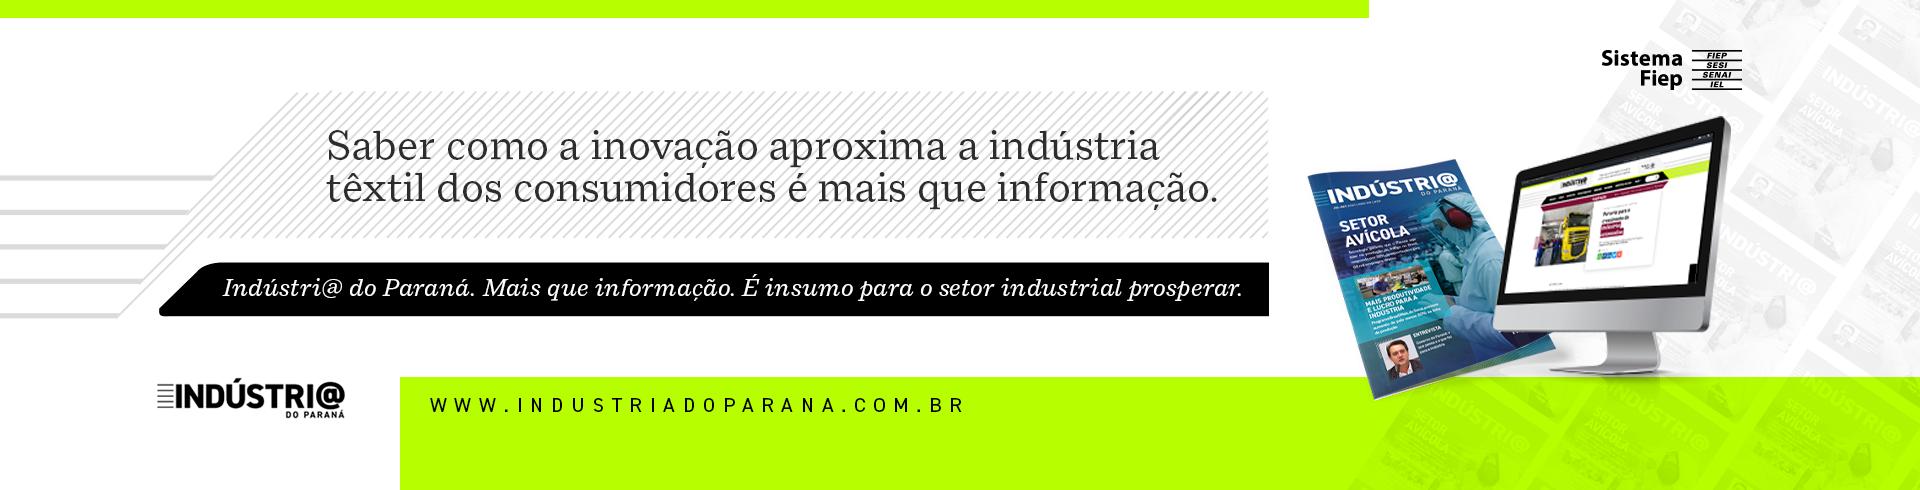 Revista Industria do Parana